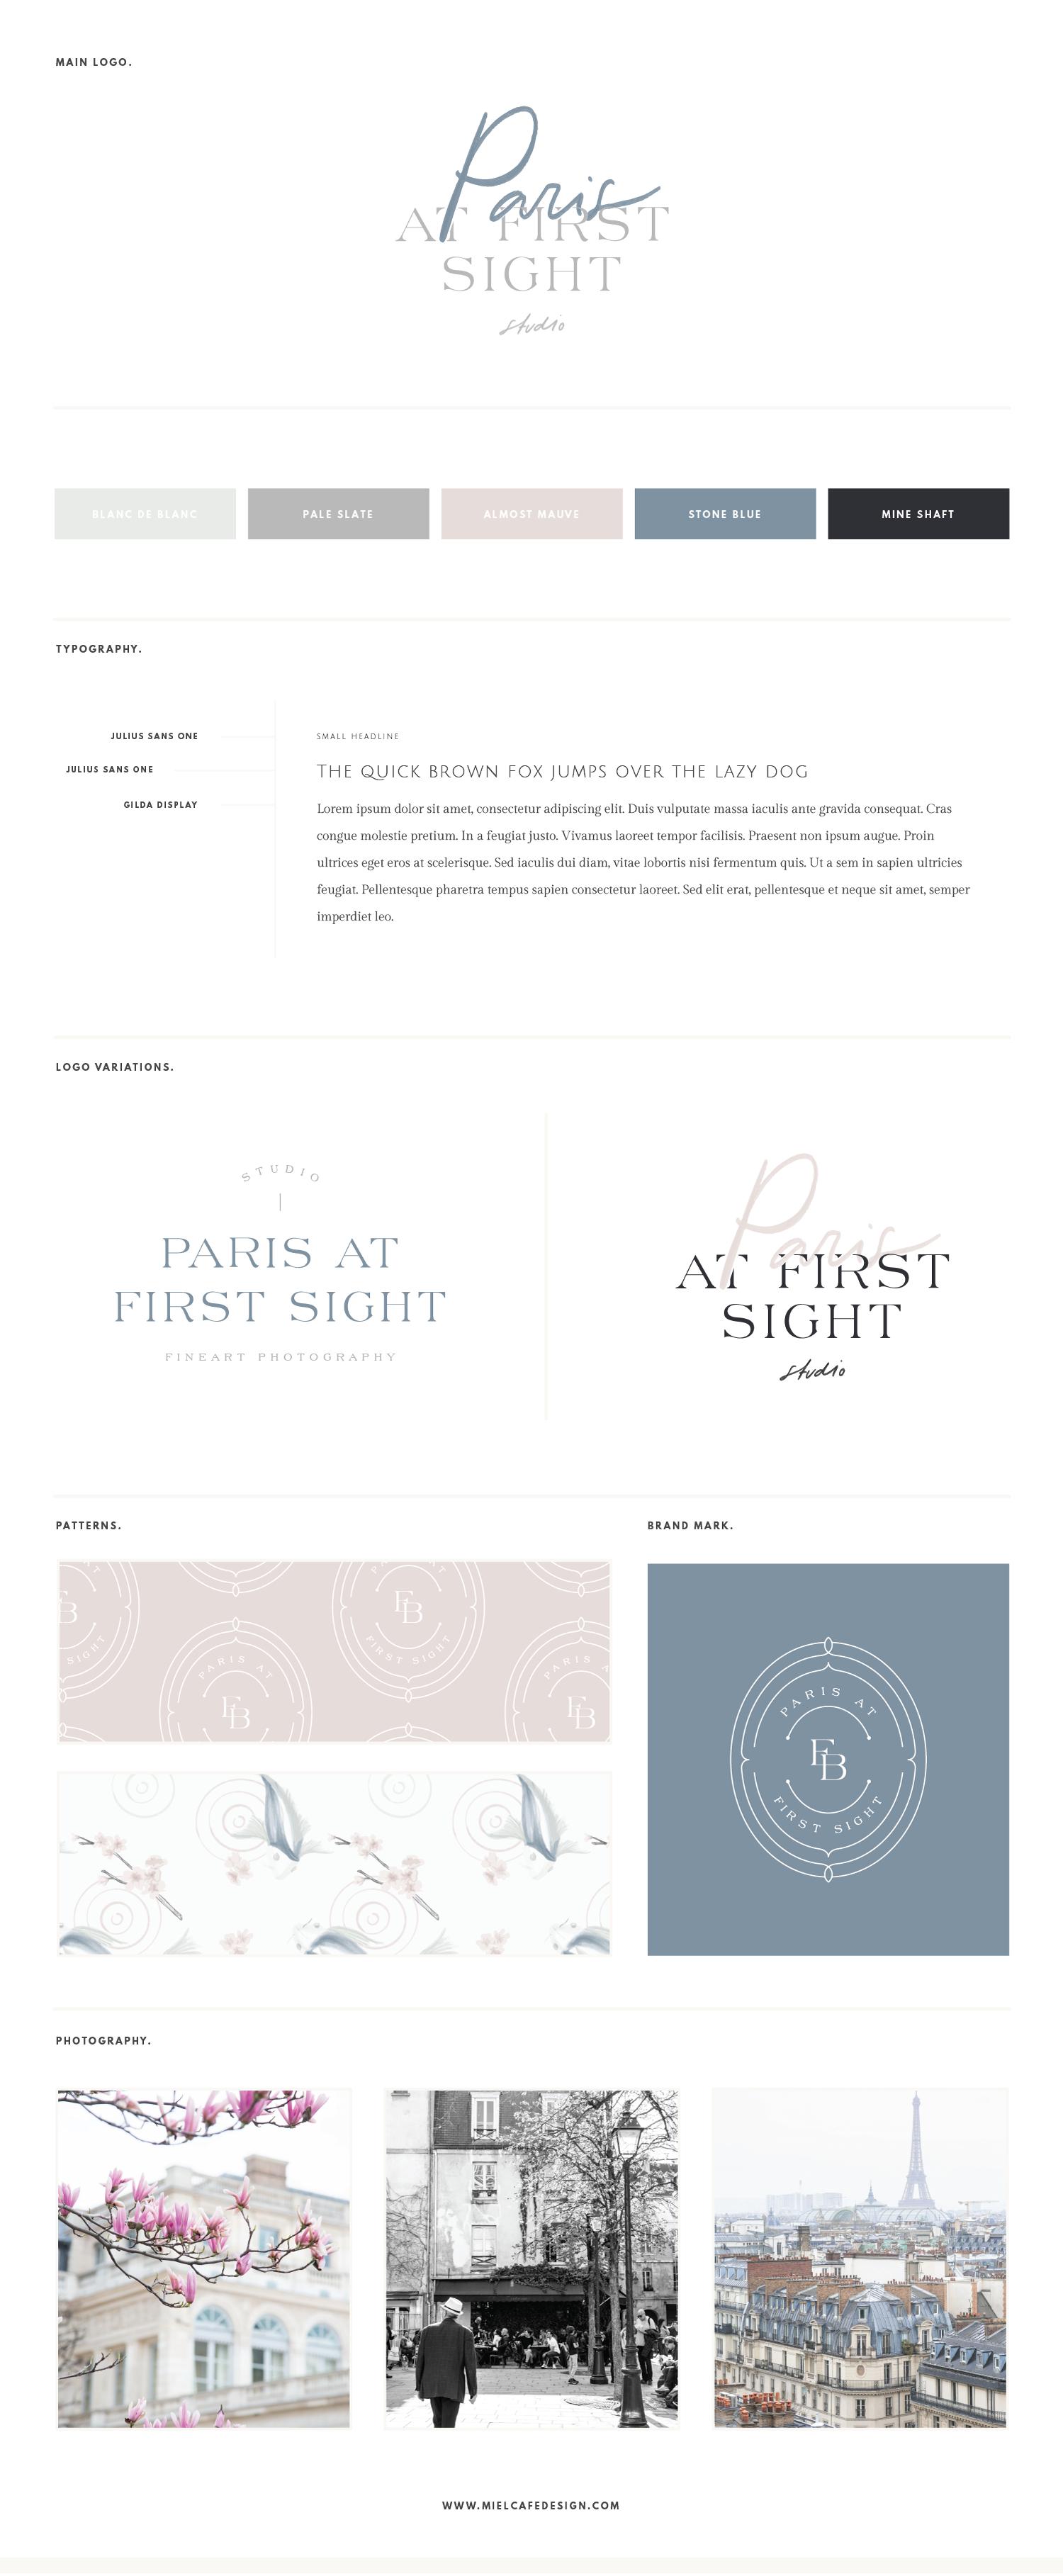 Miel Café Design Portfolio: Elegant Parisian stone blue mauve pink brand board, custom lettering logo, elegant serif, koi fish watercolor pattern for Fine Art Photography business Paris At First Sight